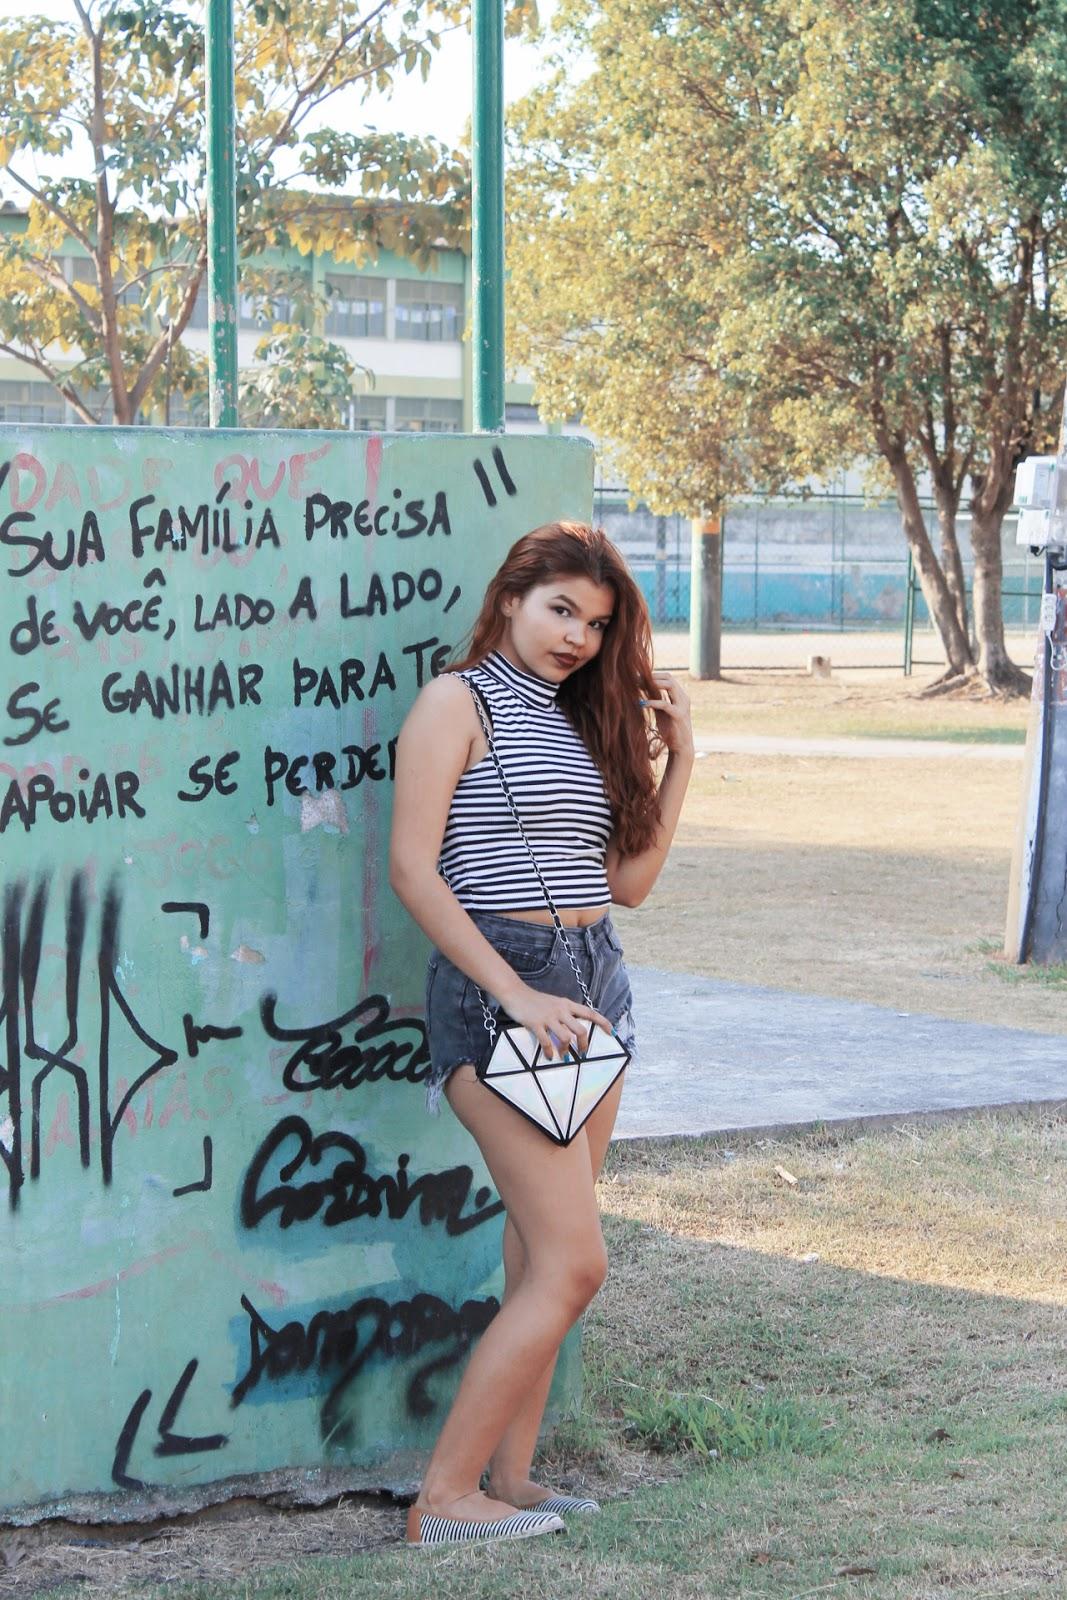 ingrid gleize, fotos tumblr, tumblr girl, look básico, cropped listras, look baratinho, look C&A, look Marisa, bolsa holográfica,